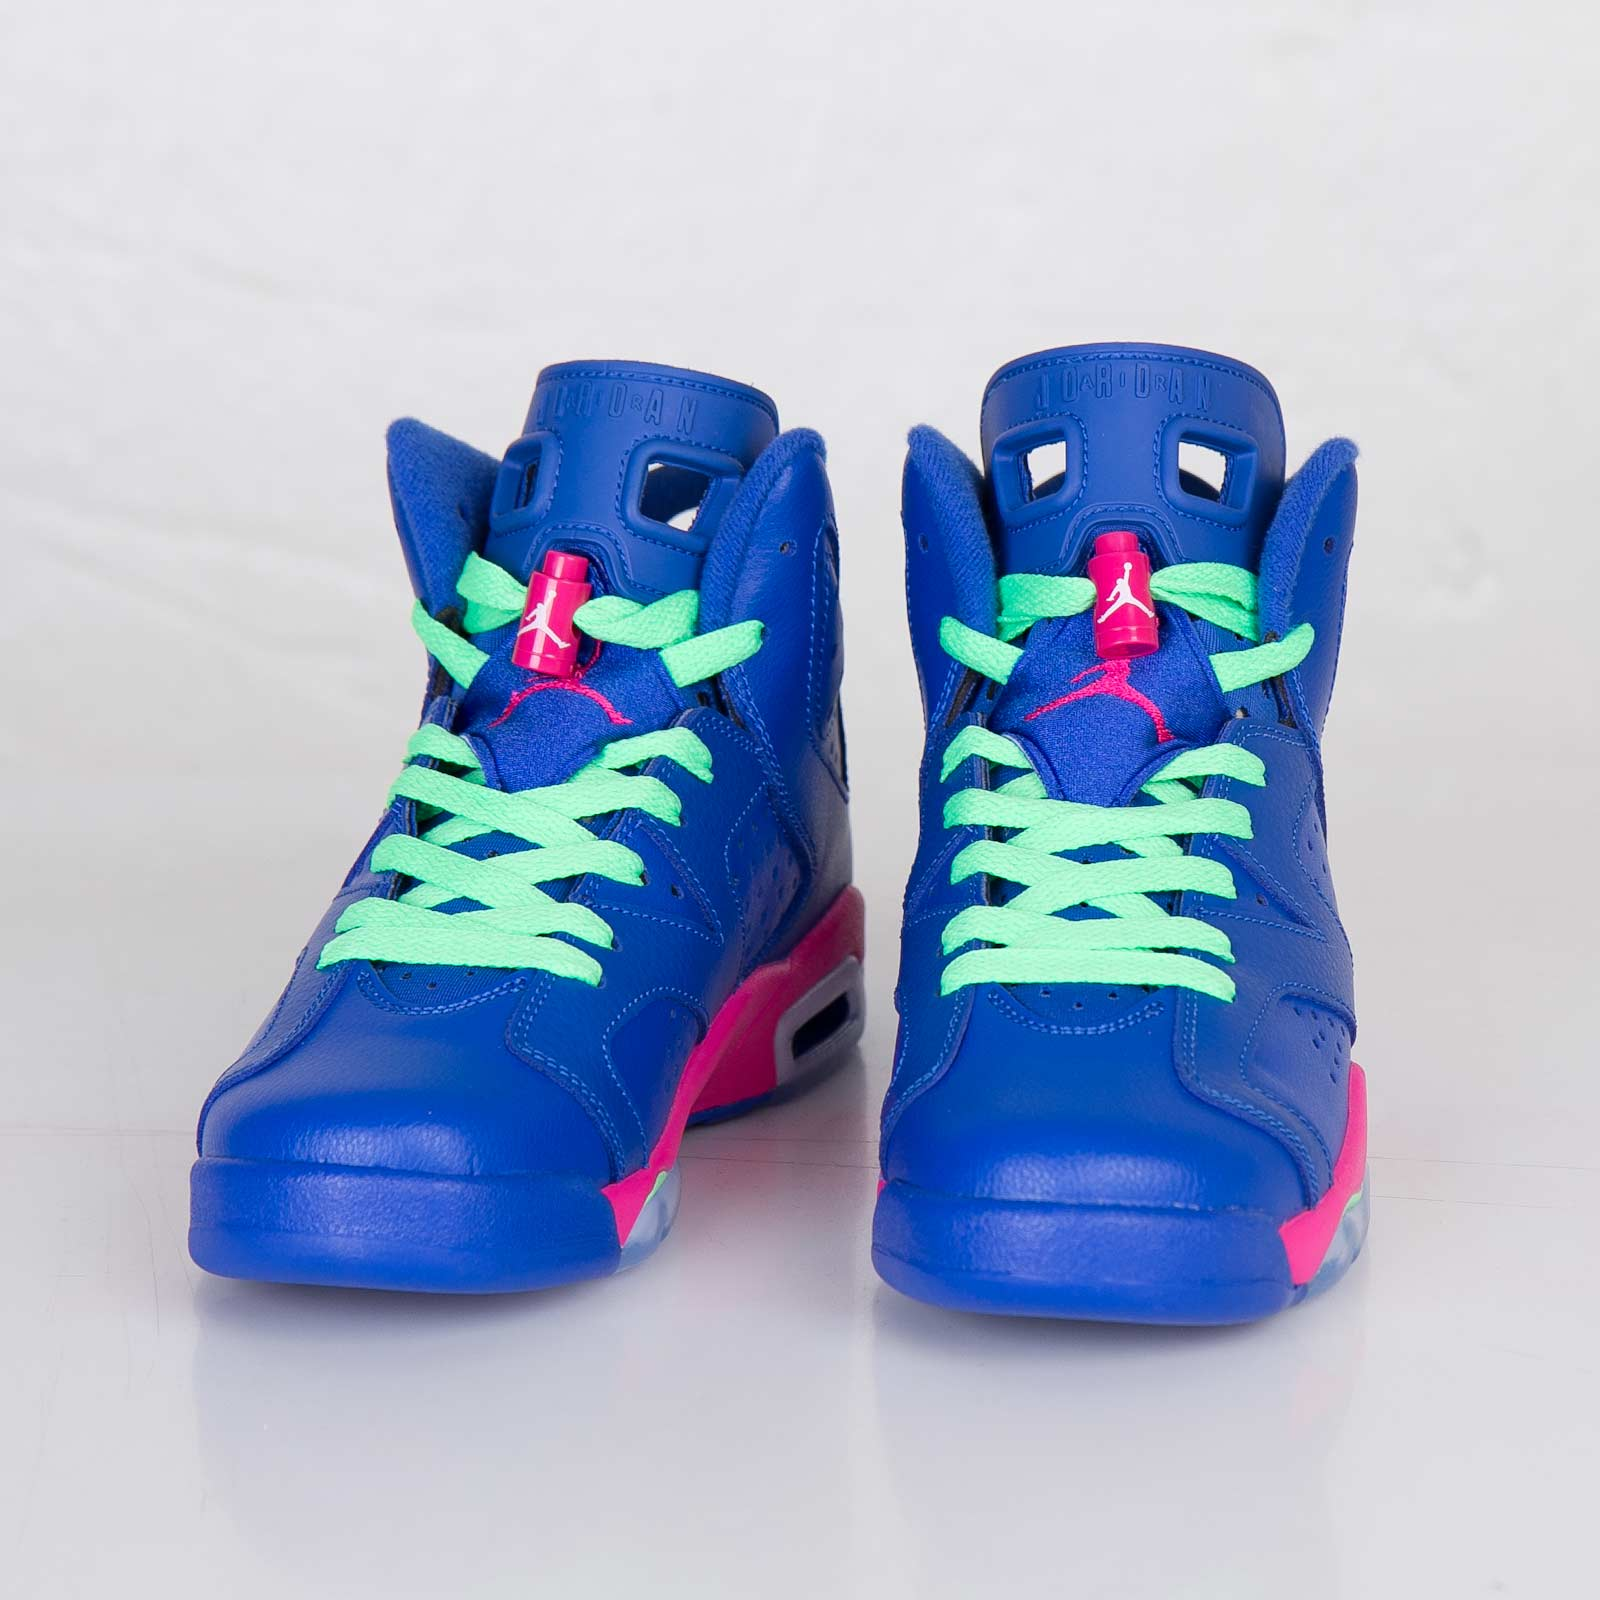 low cost 87937 3bc24 Jordan Brand Air Jordan 6 Retro (GS) - 543390-439 - Sneakersnstuff    sneakers   streetwear online since 1999